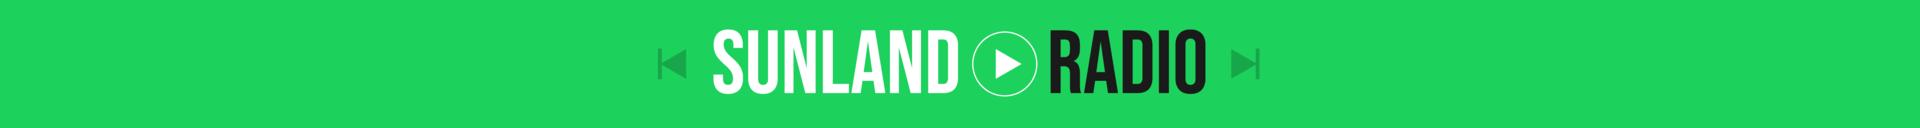 Sunland Radio